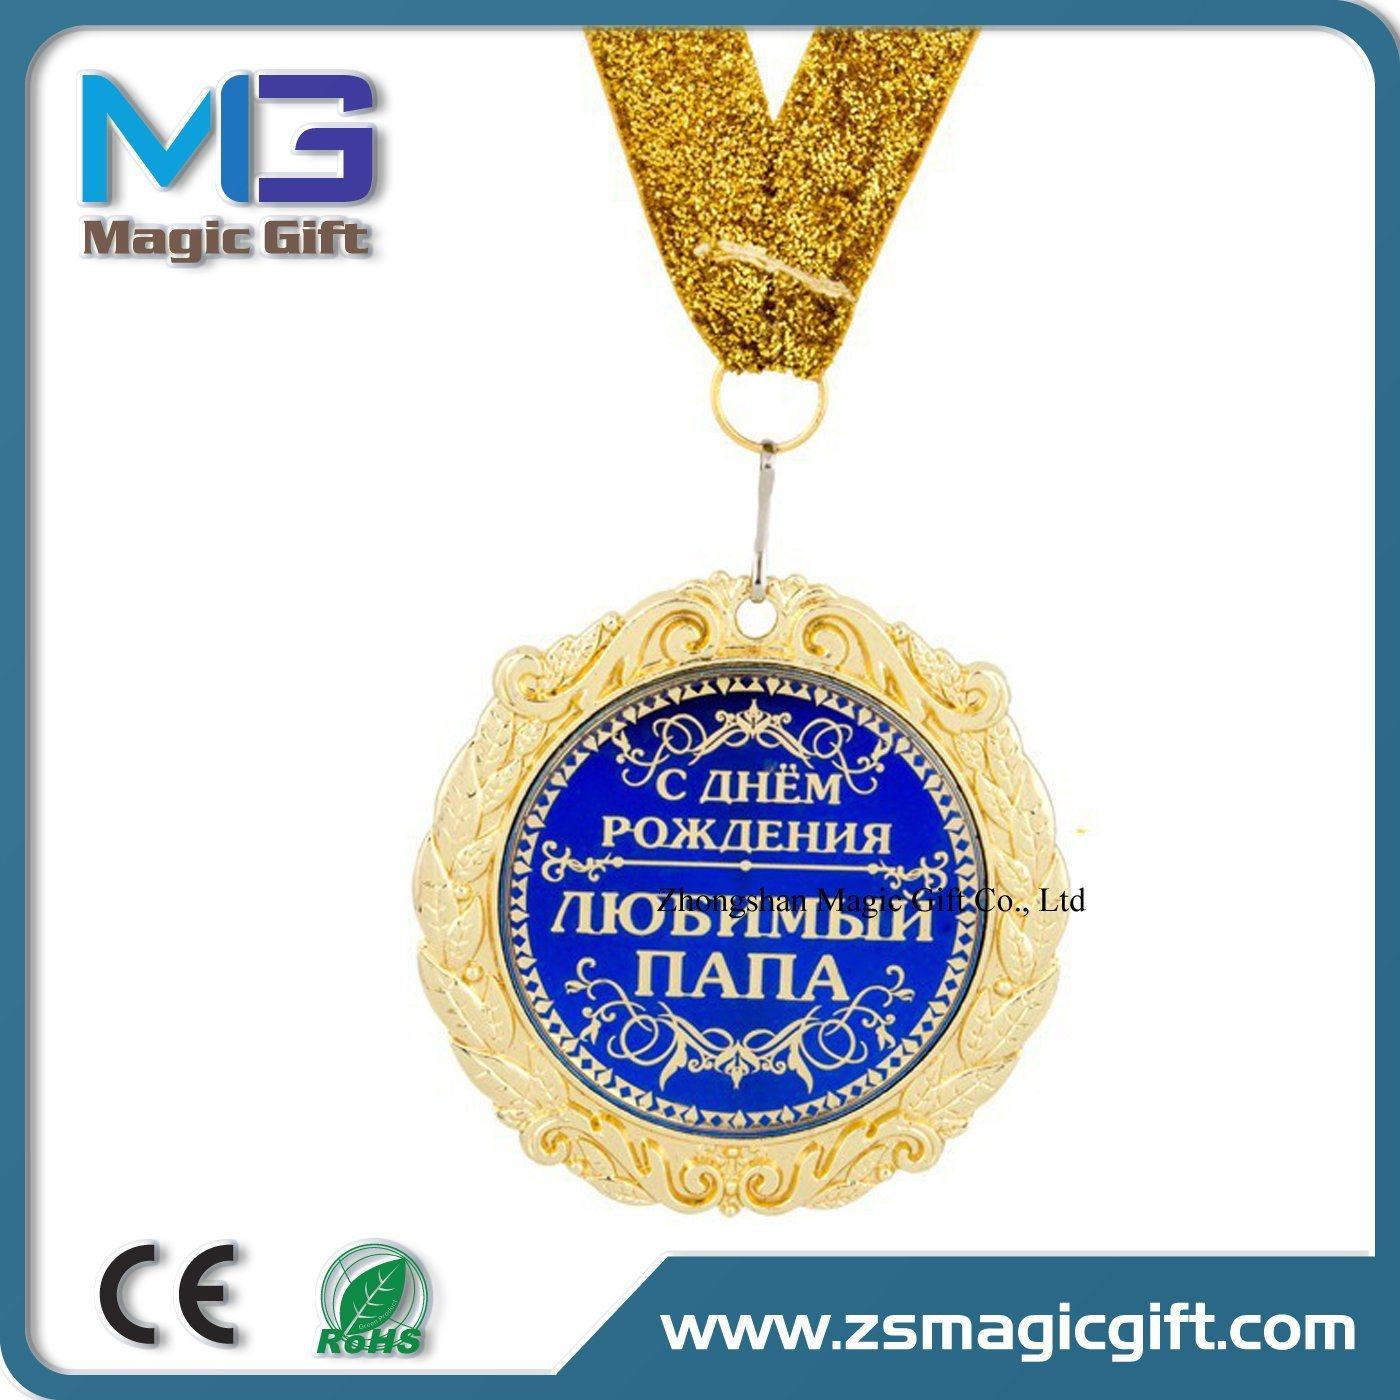 Promotional Cheap Metal Crafts Souvenir Medal Gift